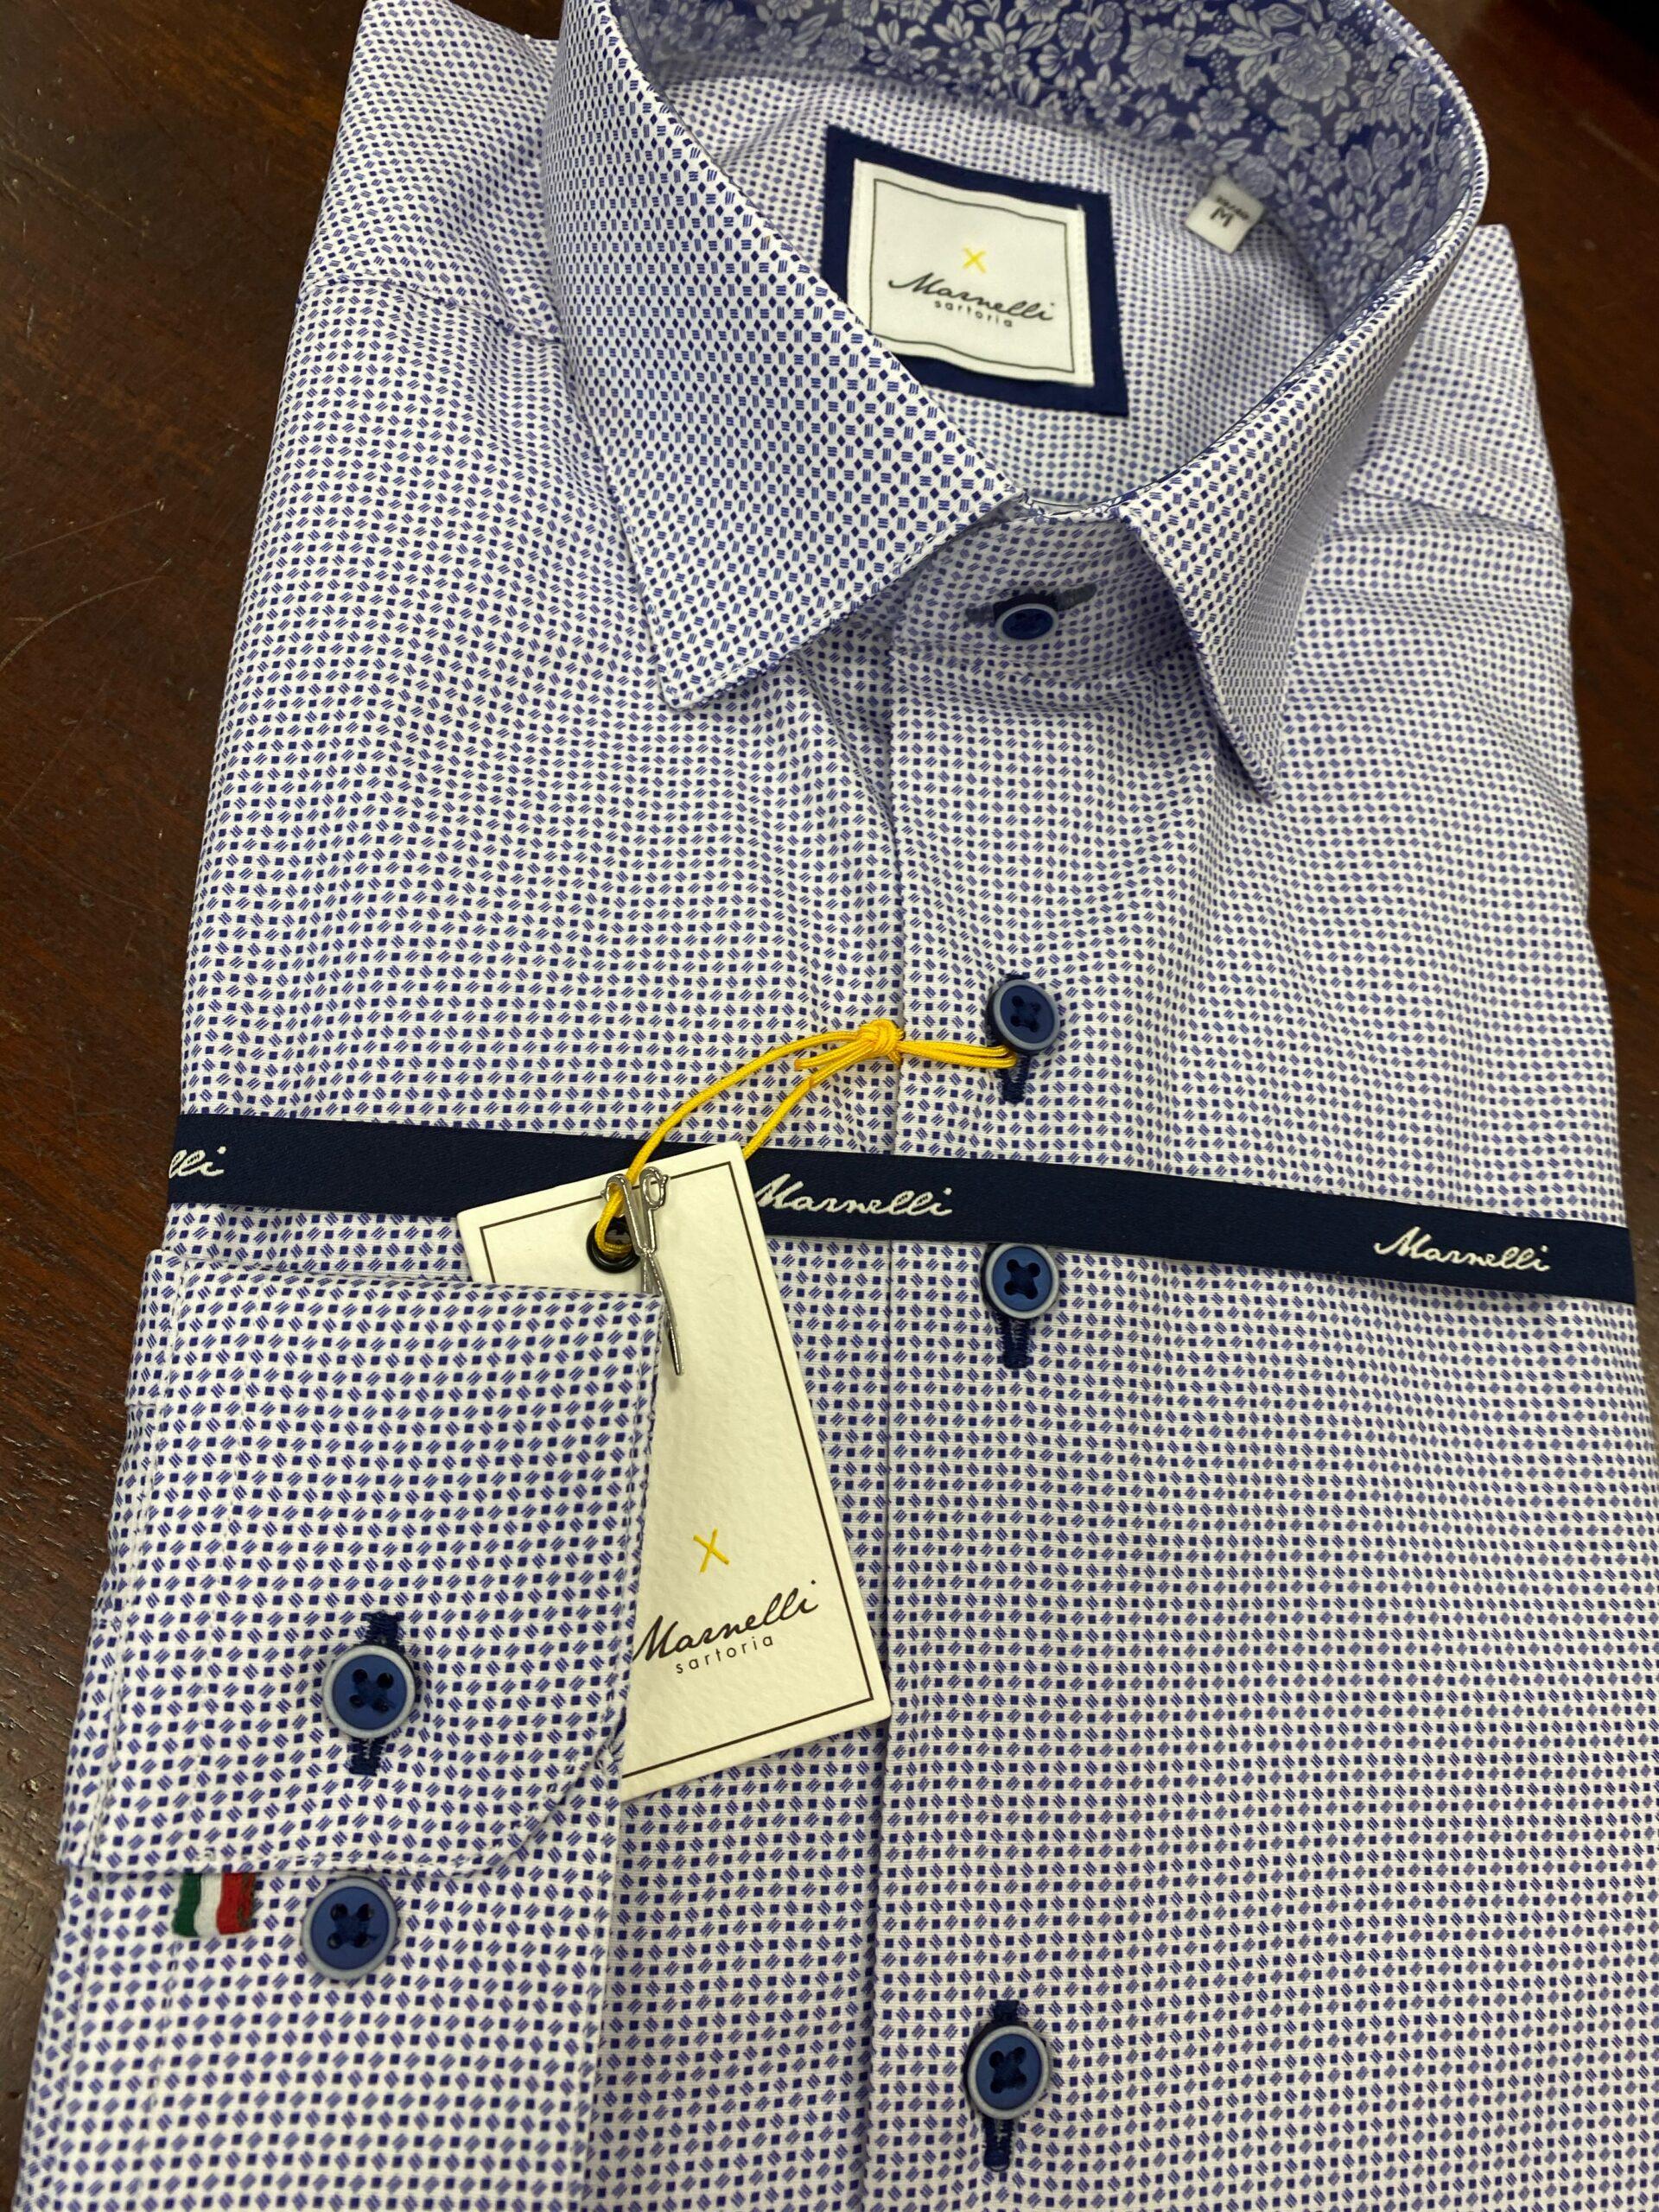 Marnelli | Jack HBD Contemporary Shirt